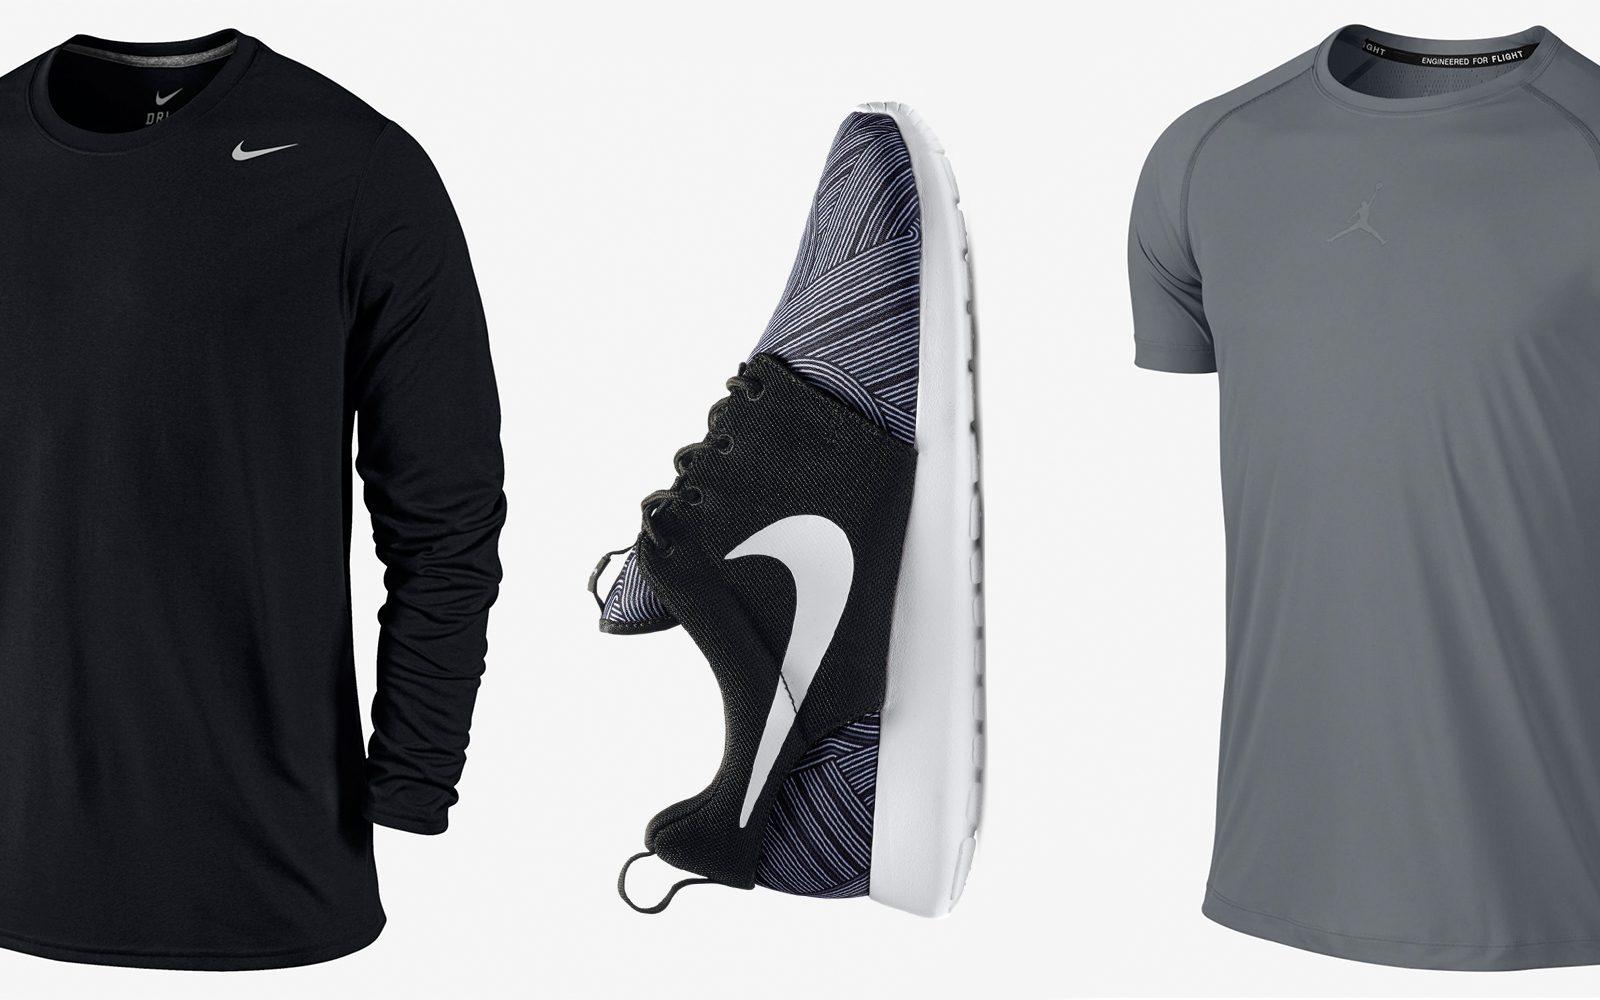 2b11a2e86 Nike Mens Legend 2.0 T Shirt Amazon | RLDM